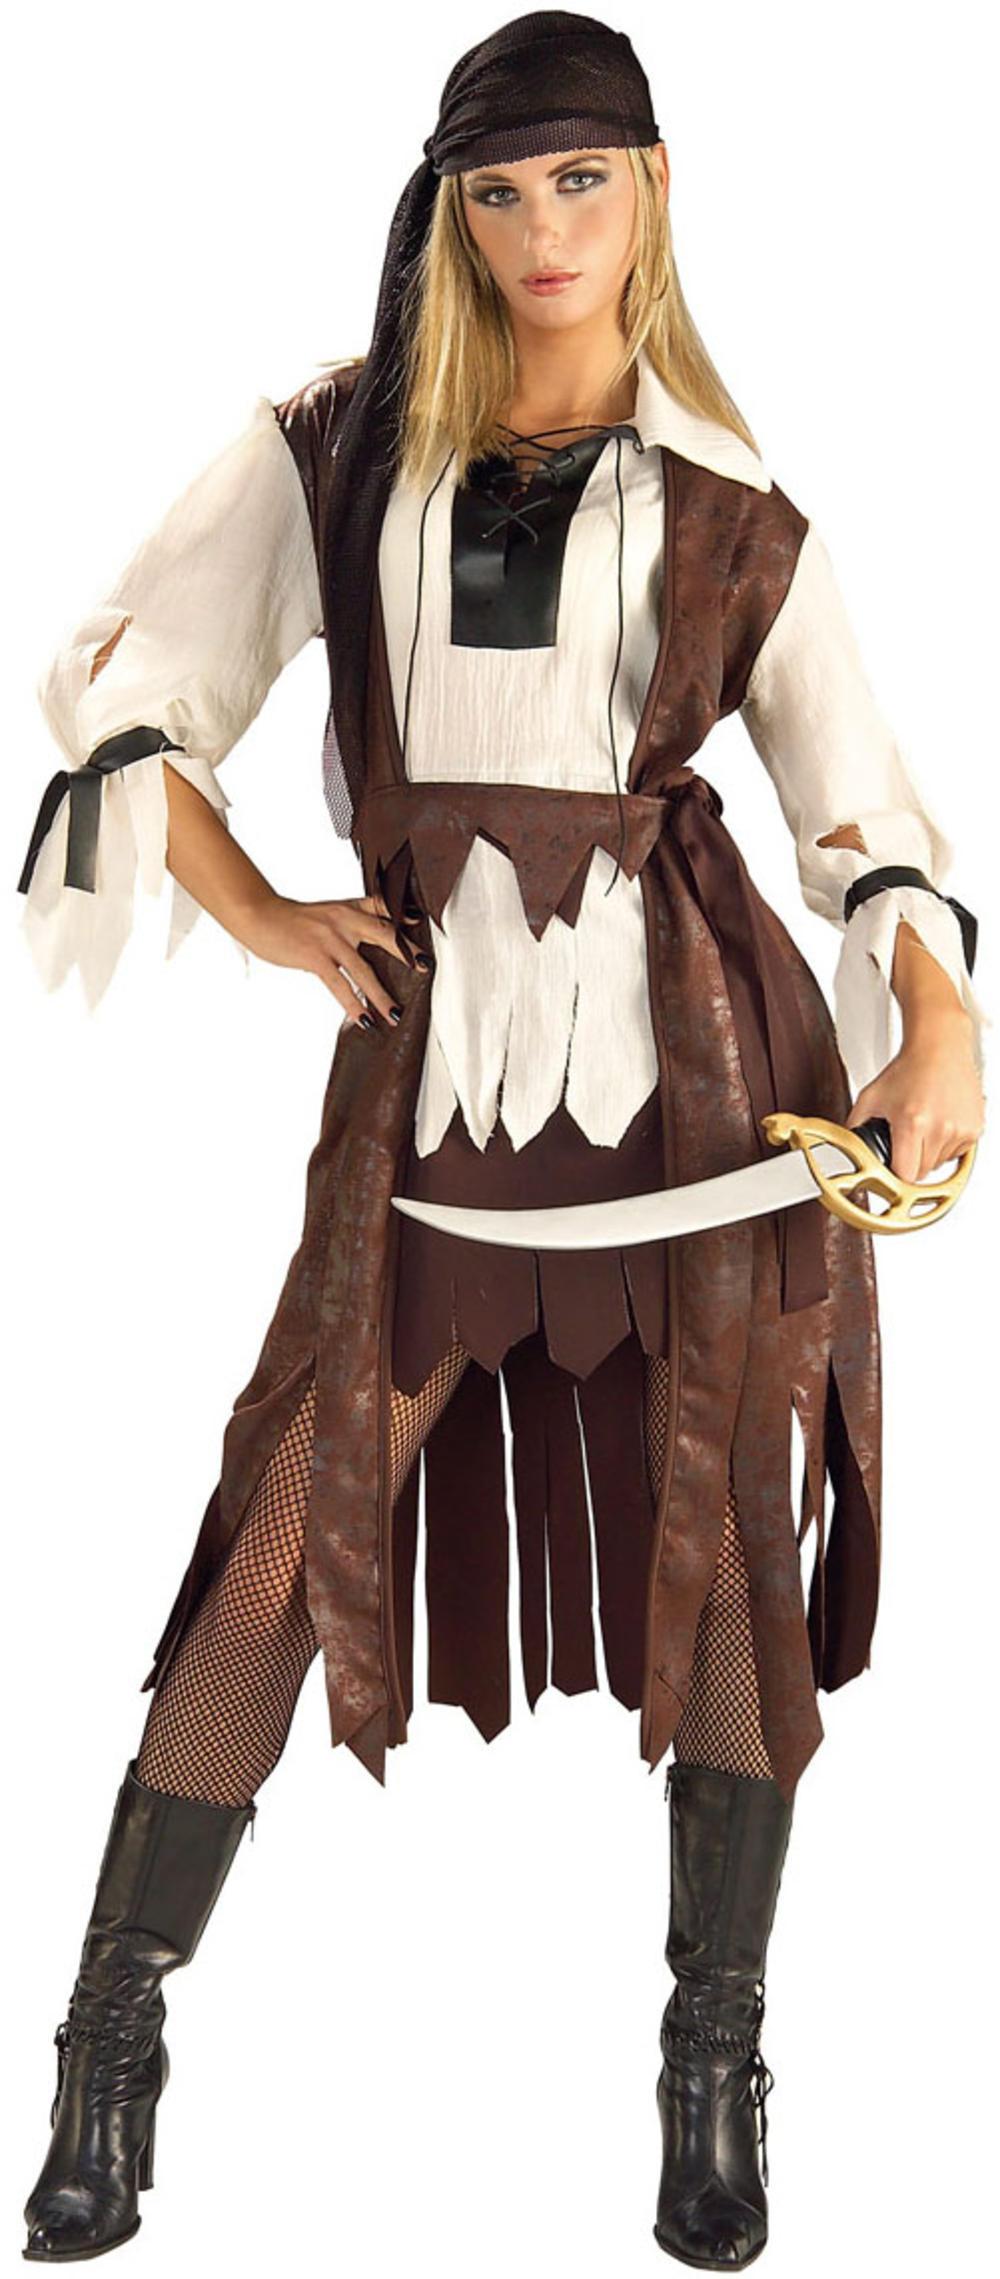 Caribbean Pirate Babe Women's Costume